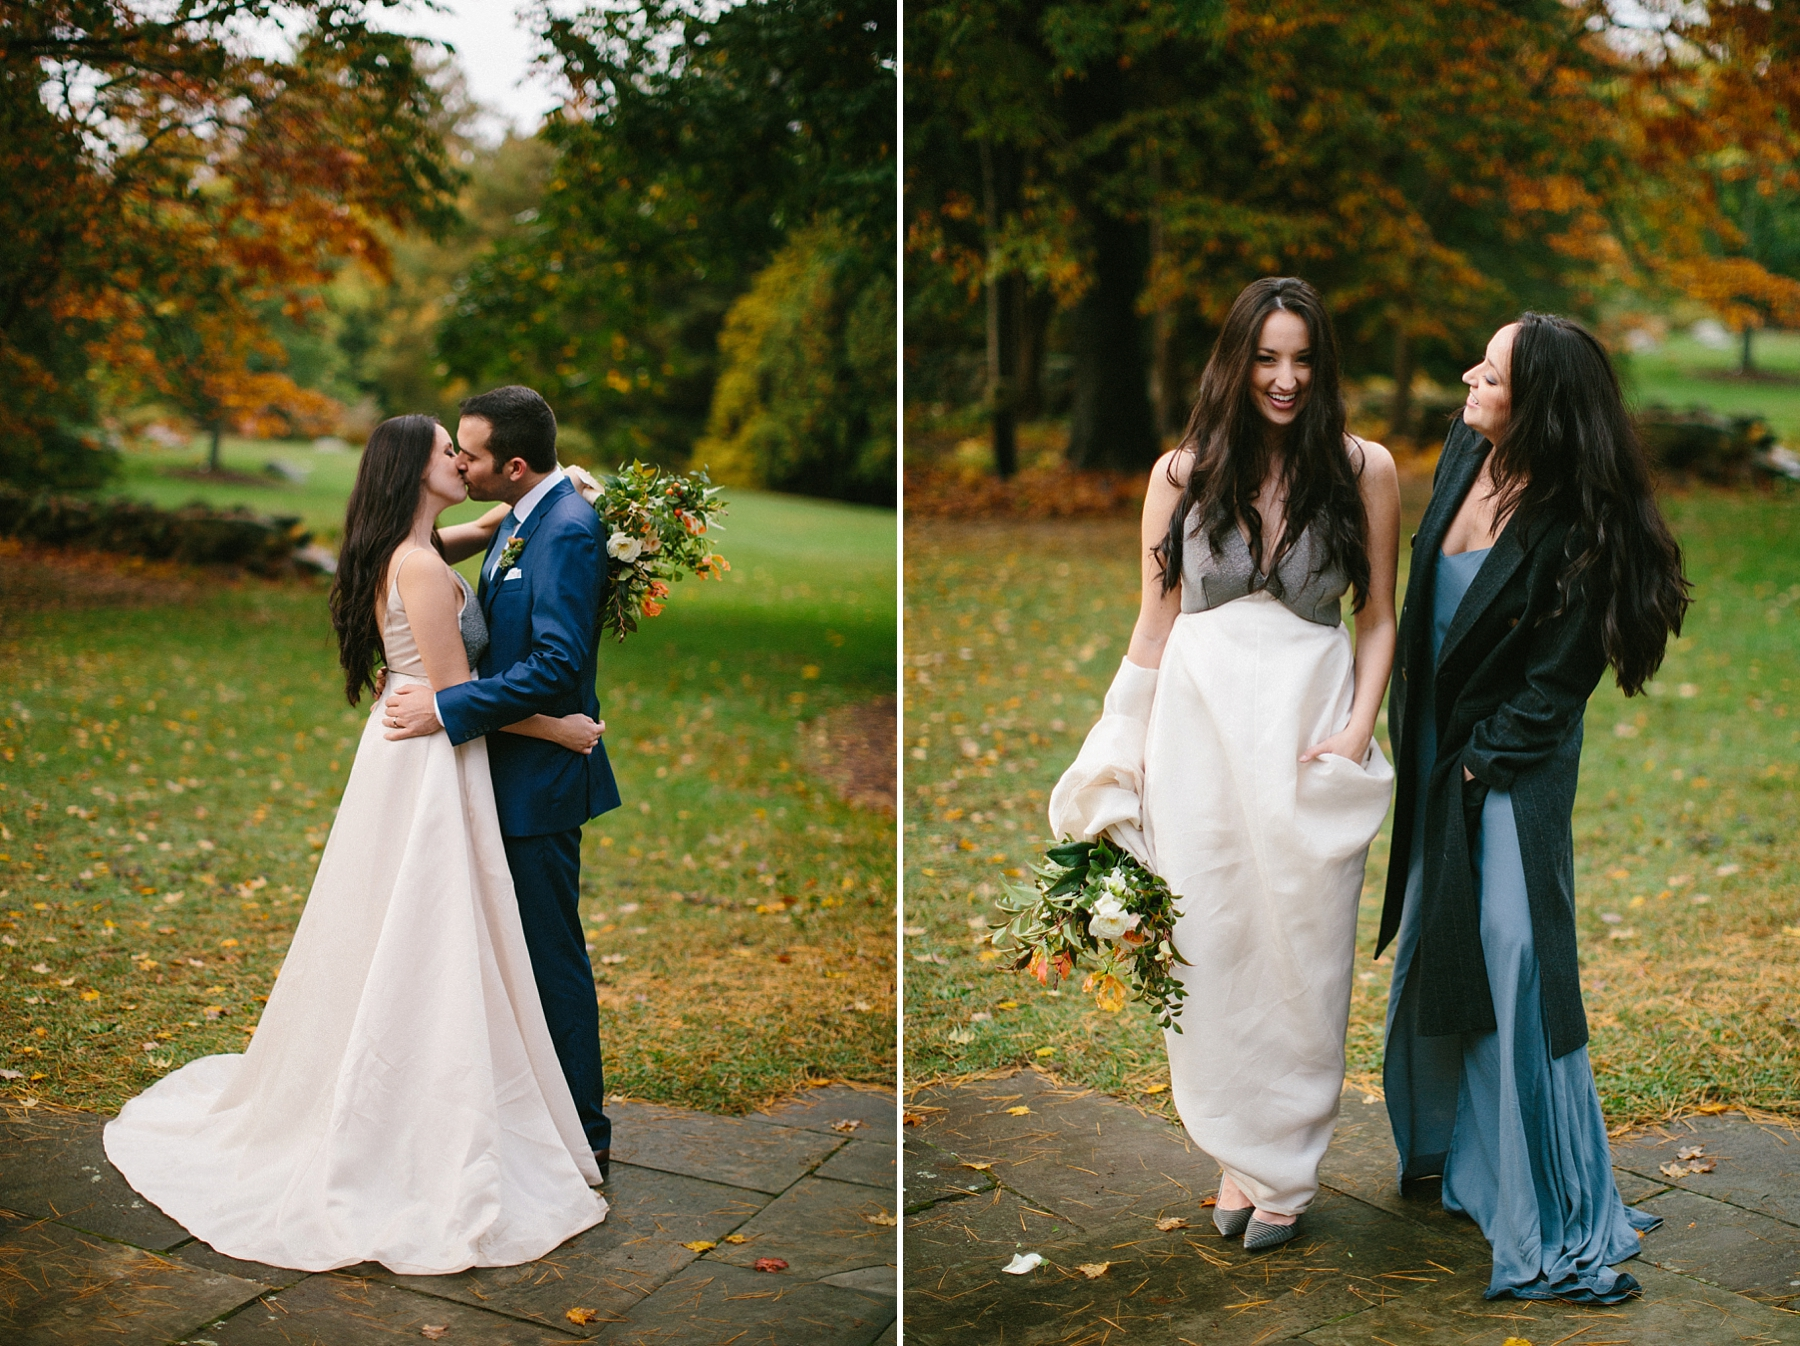 intimate-destination-wedding-photographer-outdoor_0113.jpg